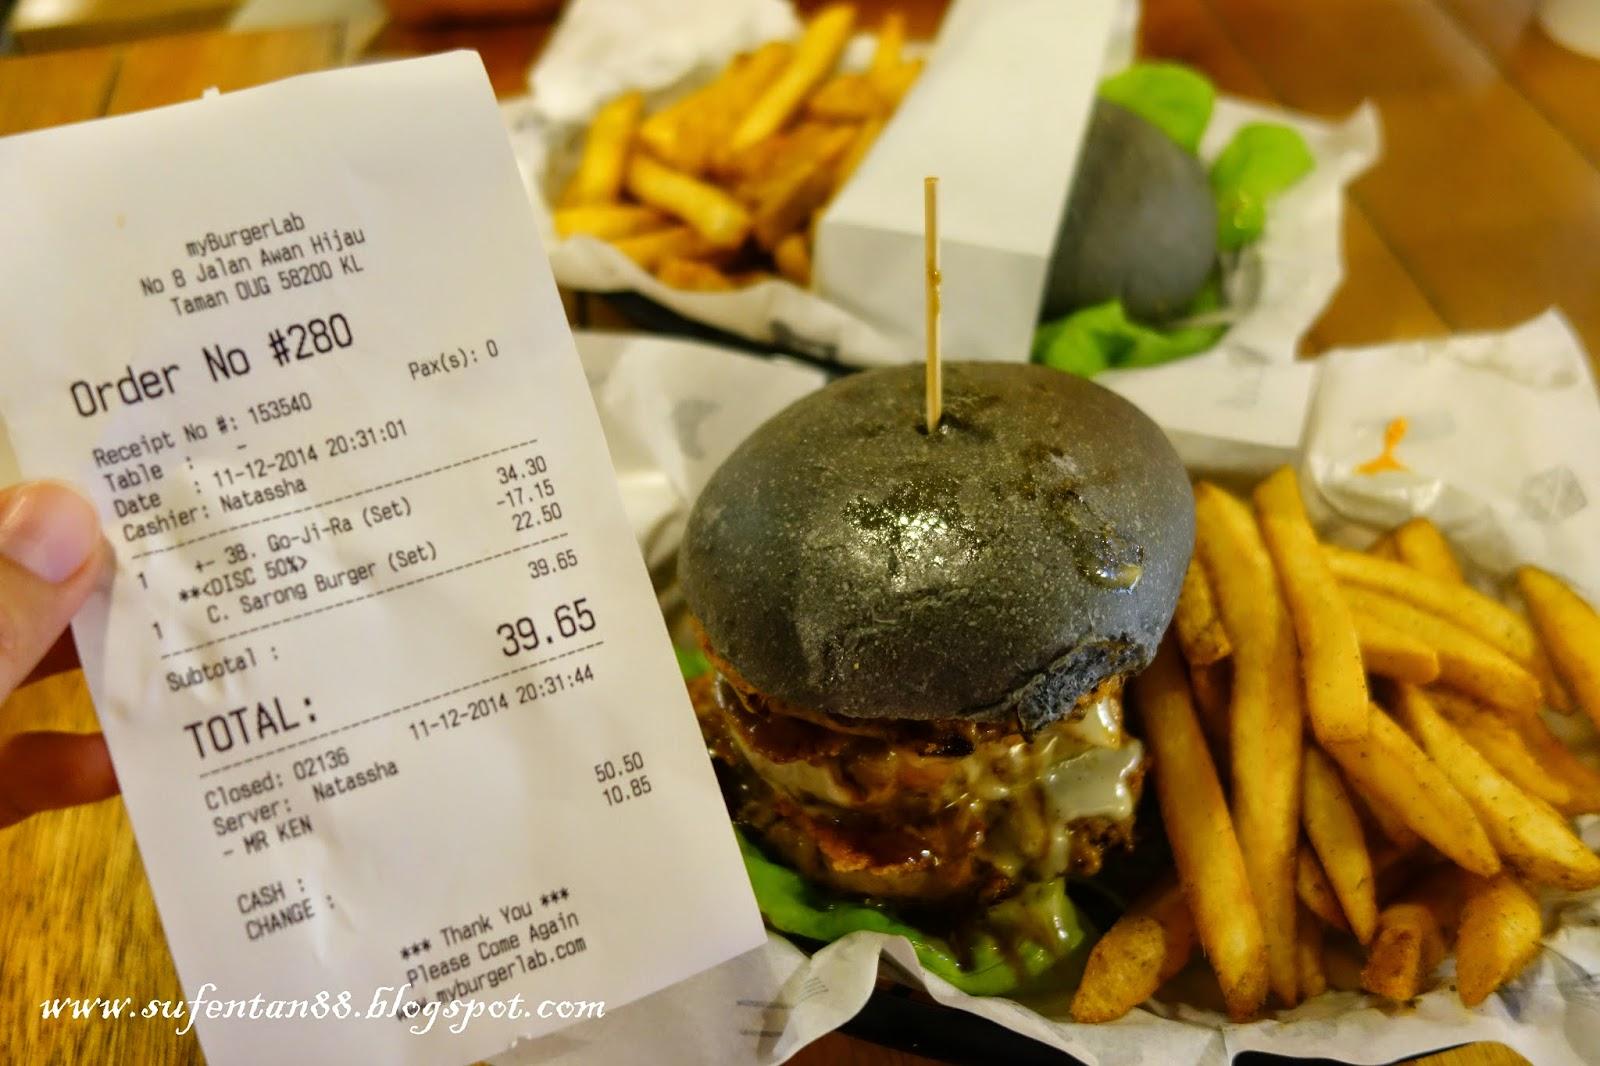 Go-Ji-Ra burger